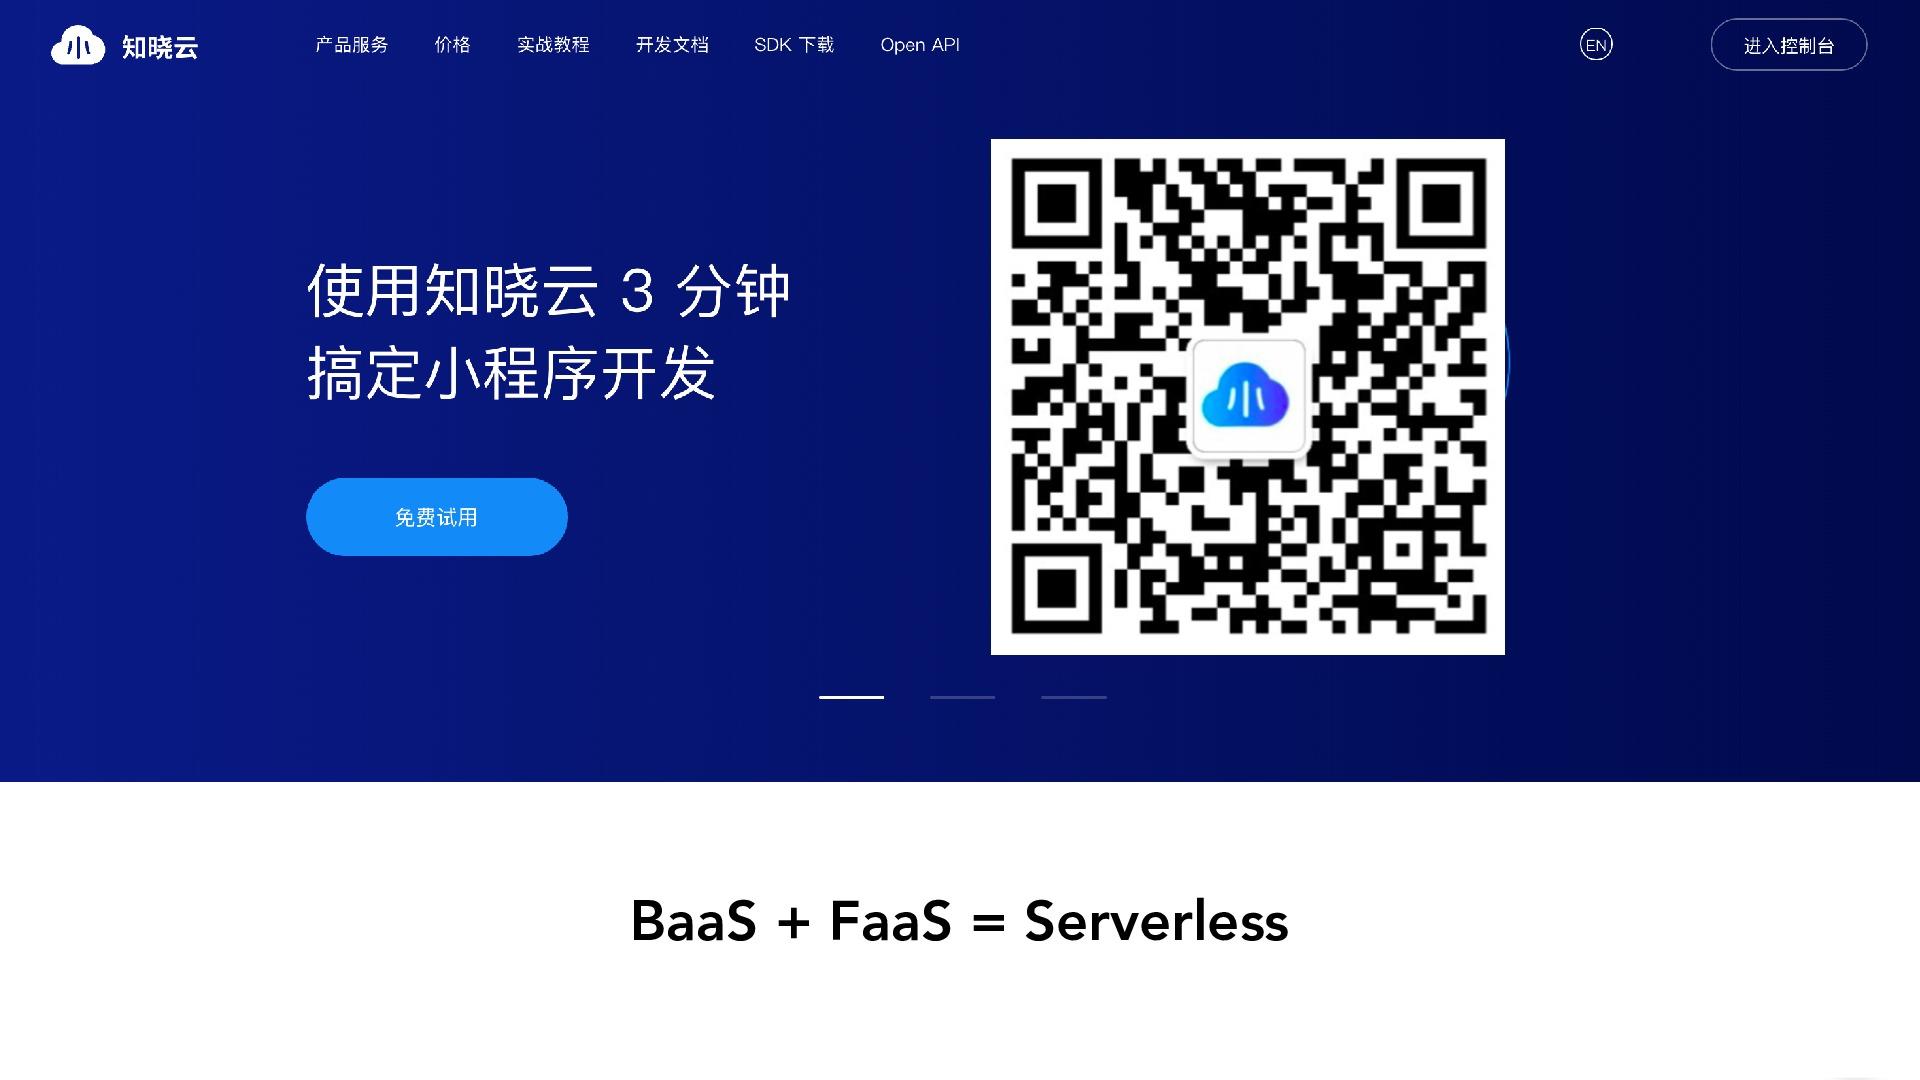 https://opentalk-blog.b0.upaiyun.com/prod/2018-11-26/7327d4f4abac070e49fda461bfb0474d